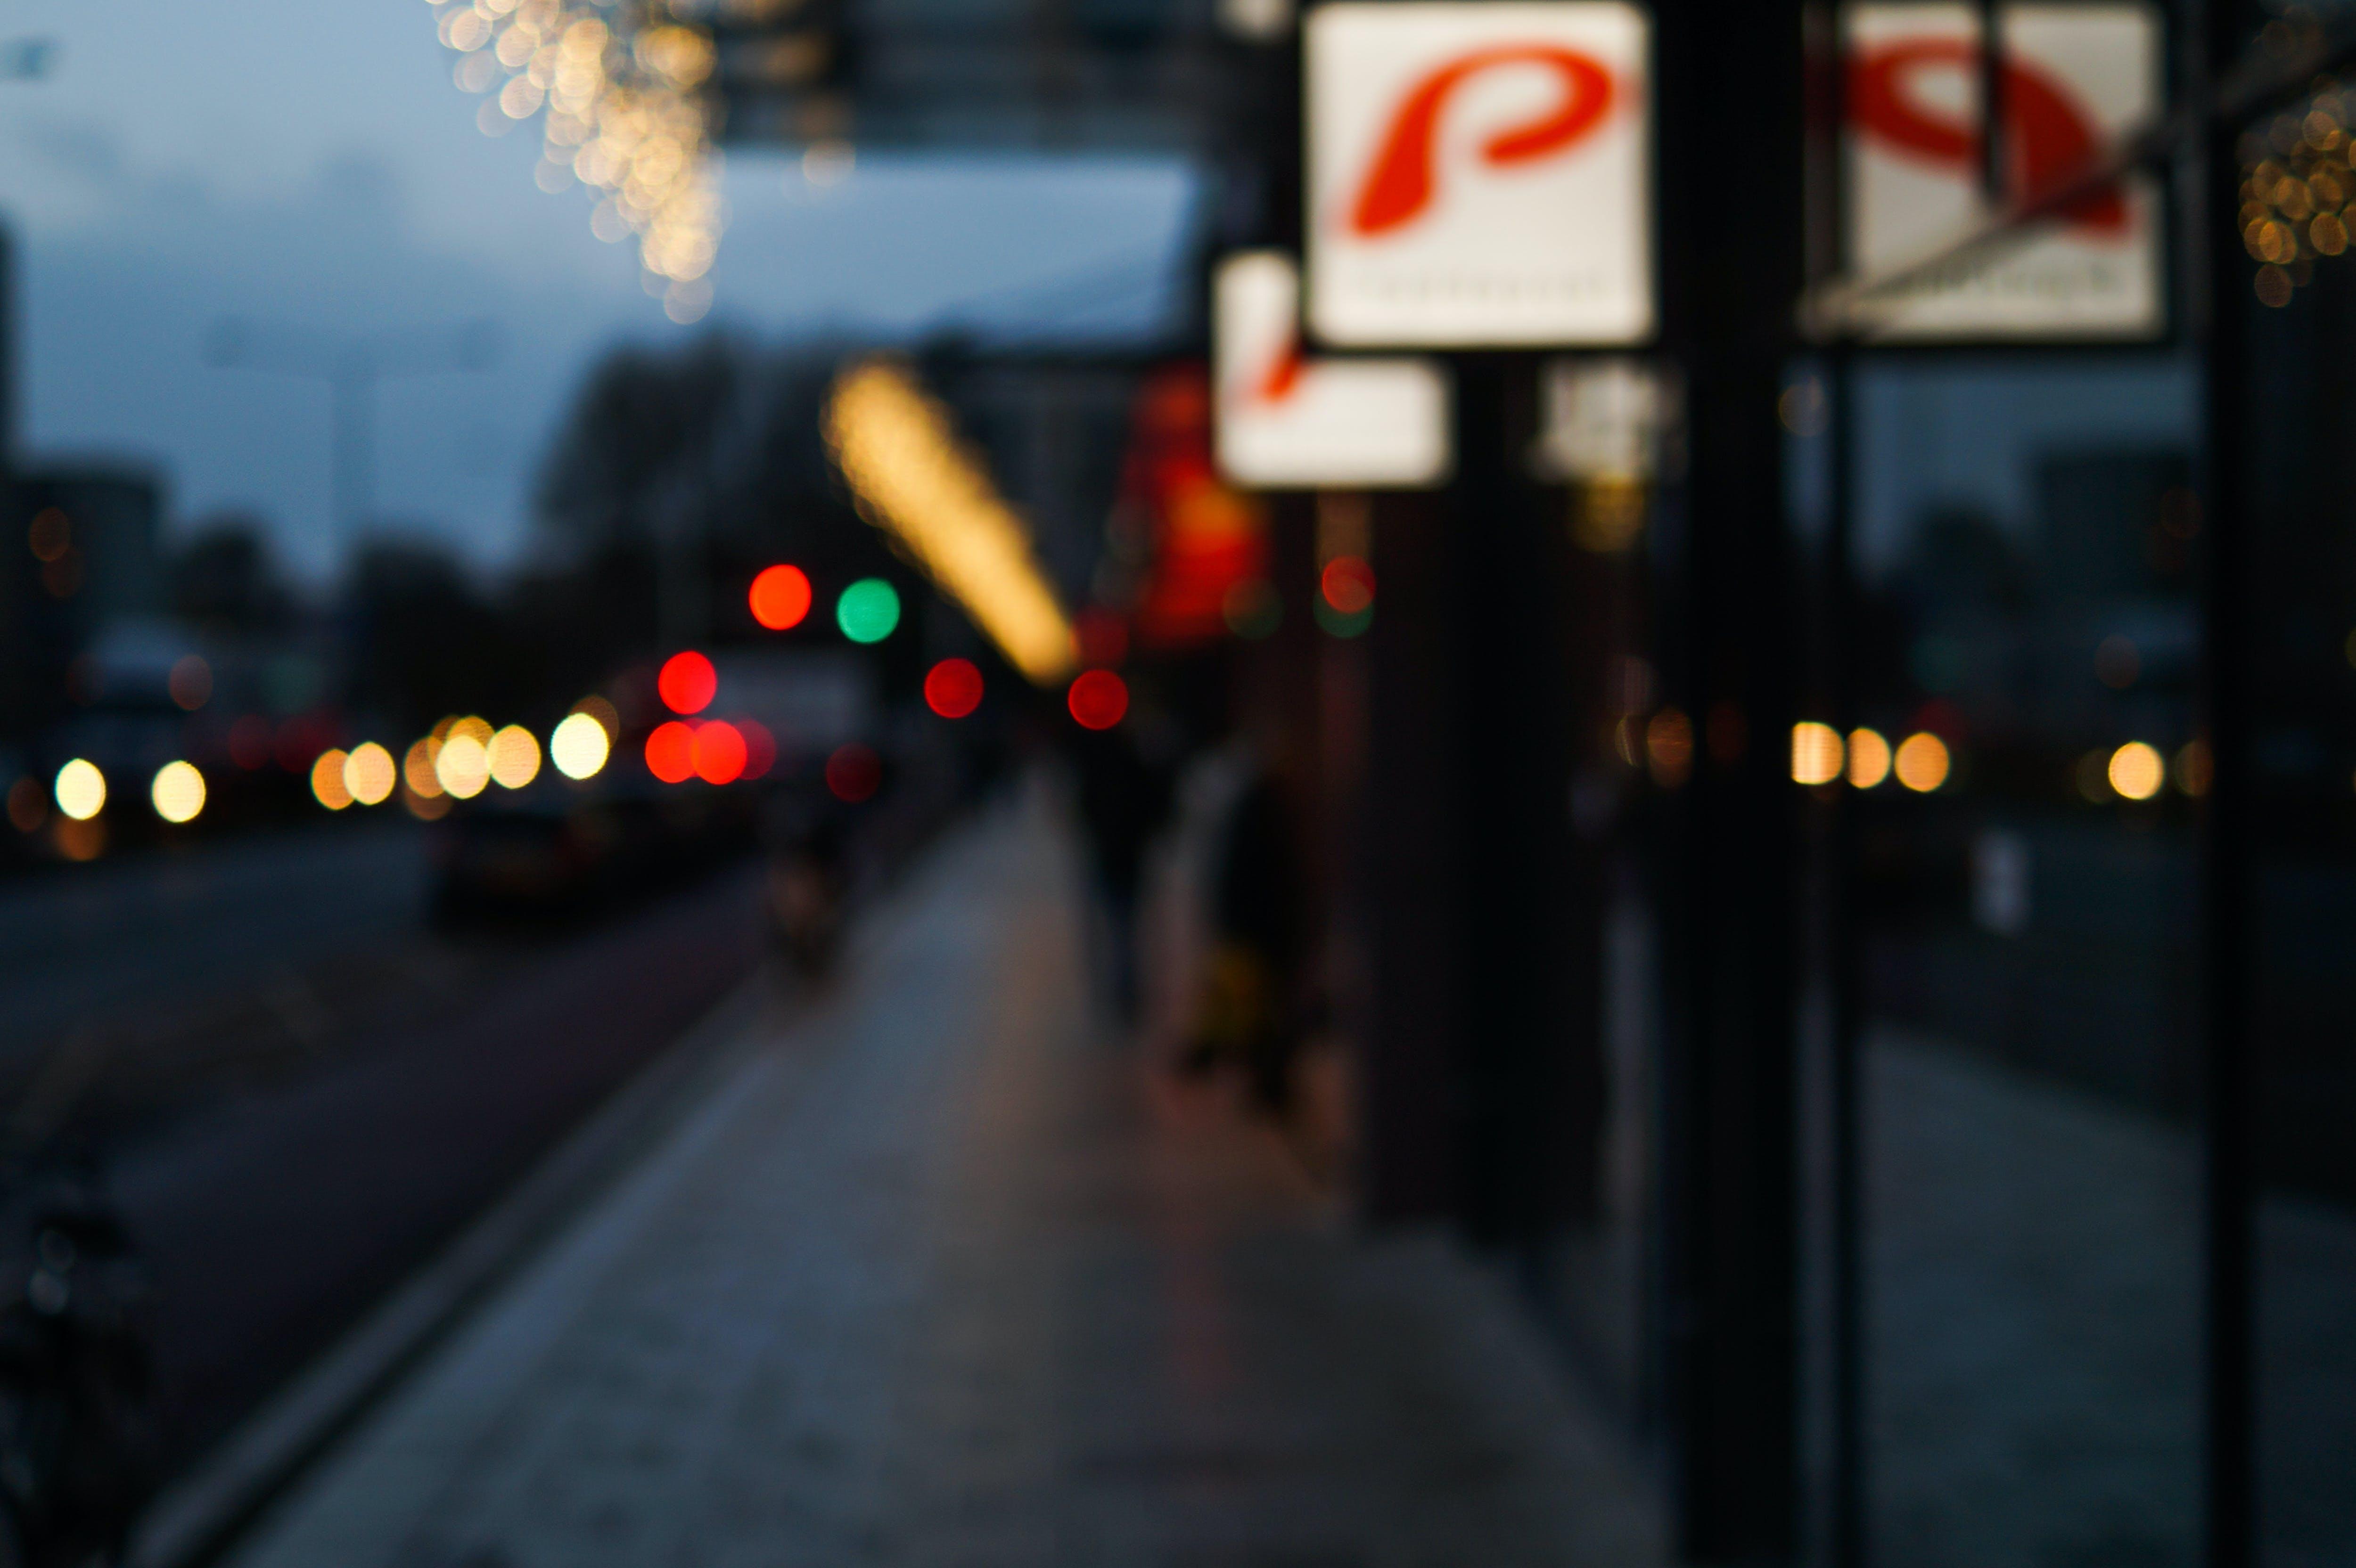 dark blurred background  u00b7 free stock photo